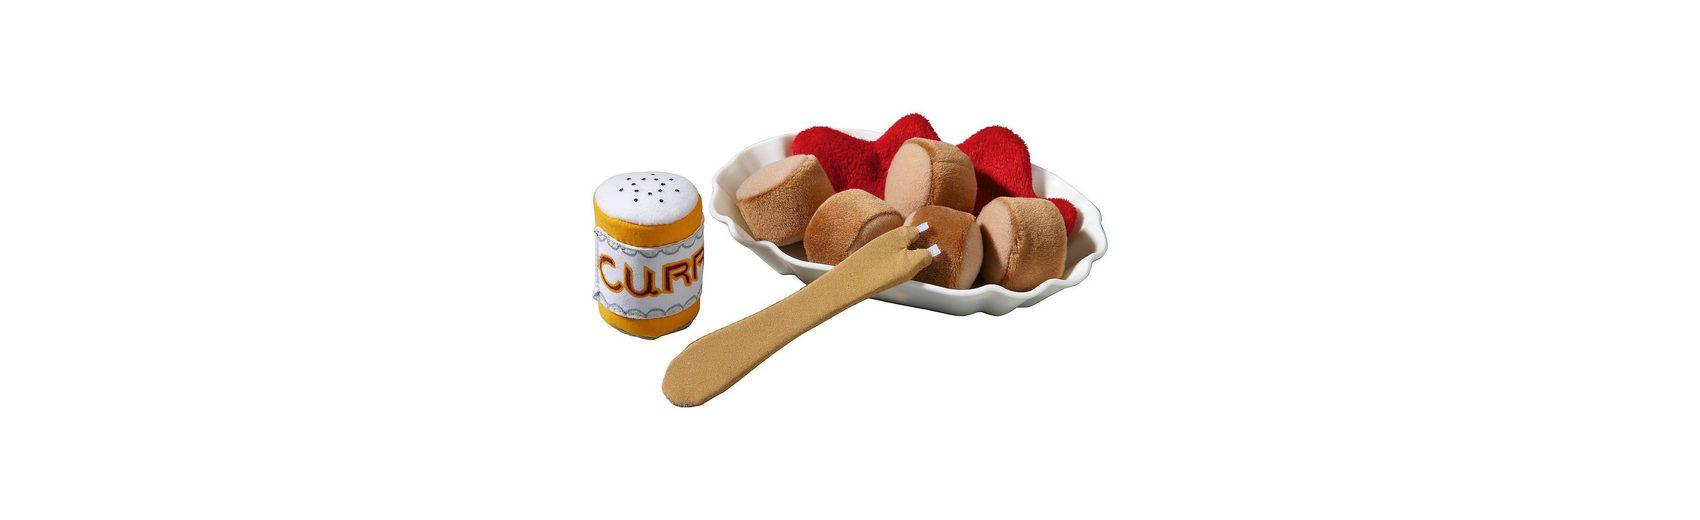 Haba 301028 Currywurst